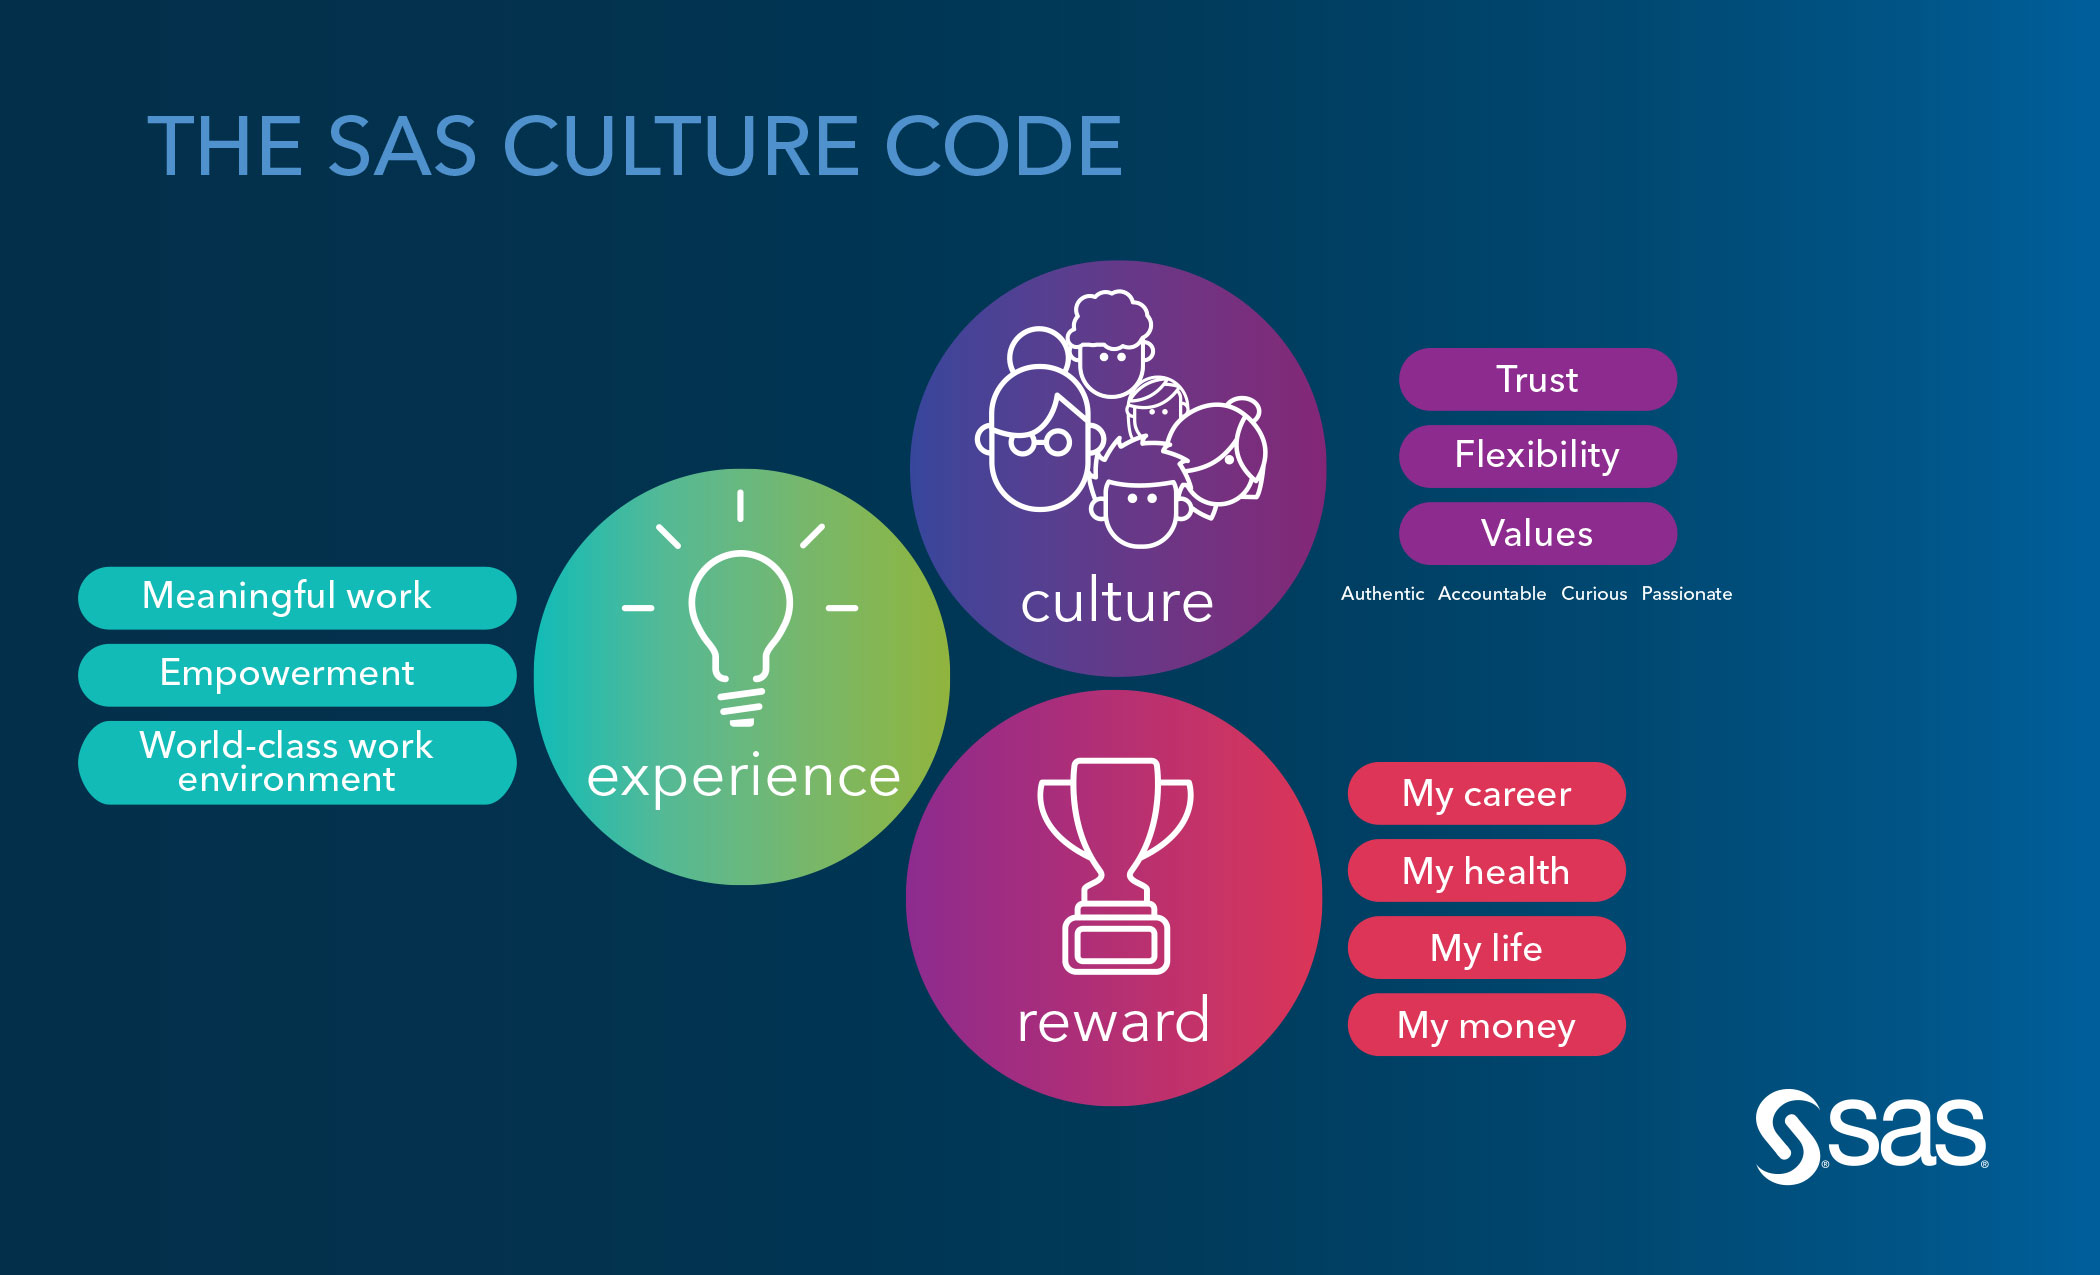 The SAS Culture Code